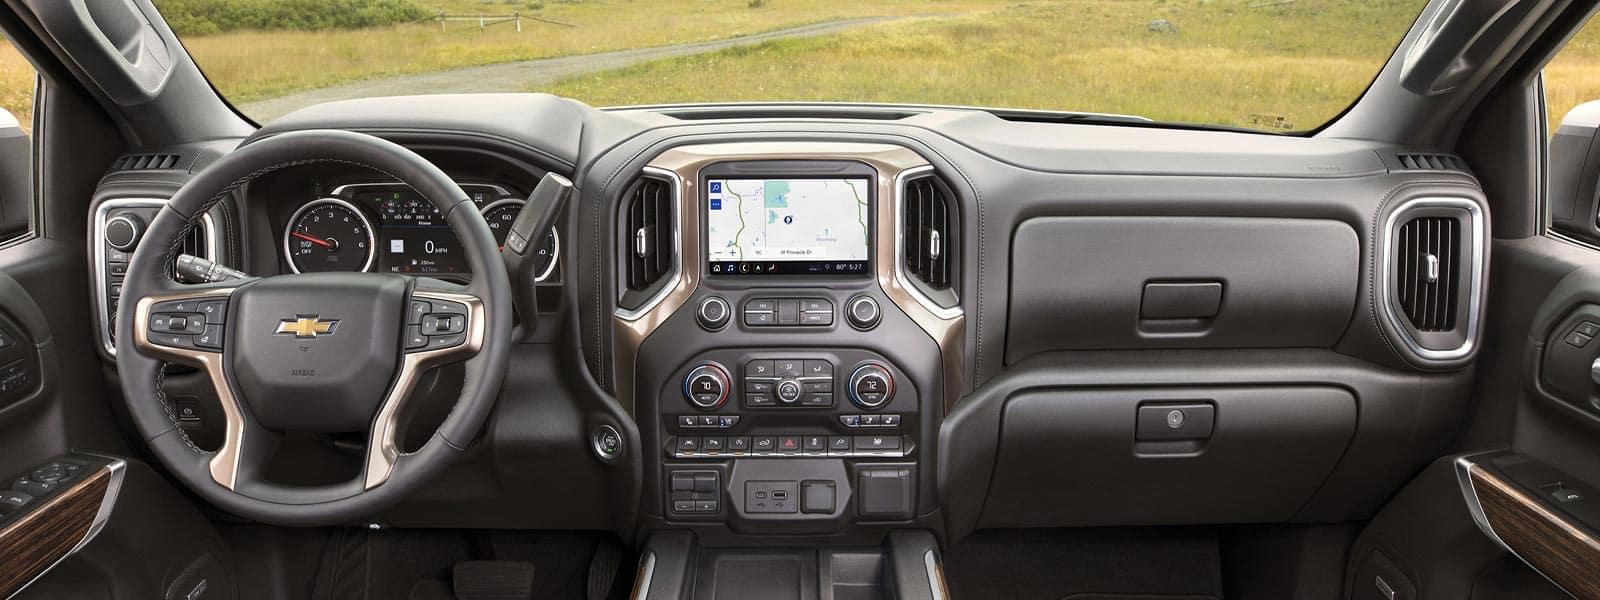 Buy 2021 Chevrolet Silverado 1500 in Weyburn Saskatchewan